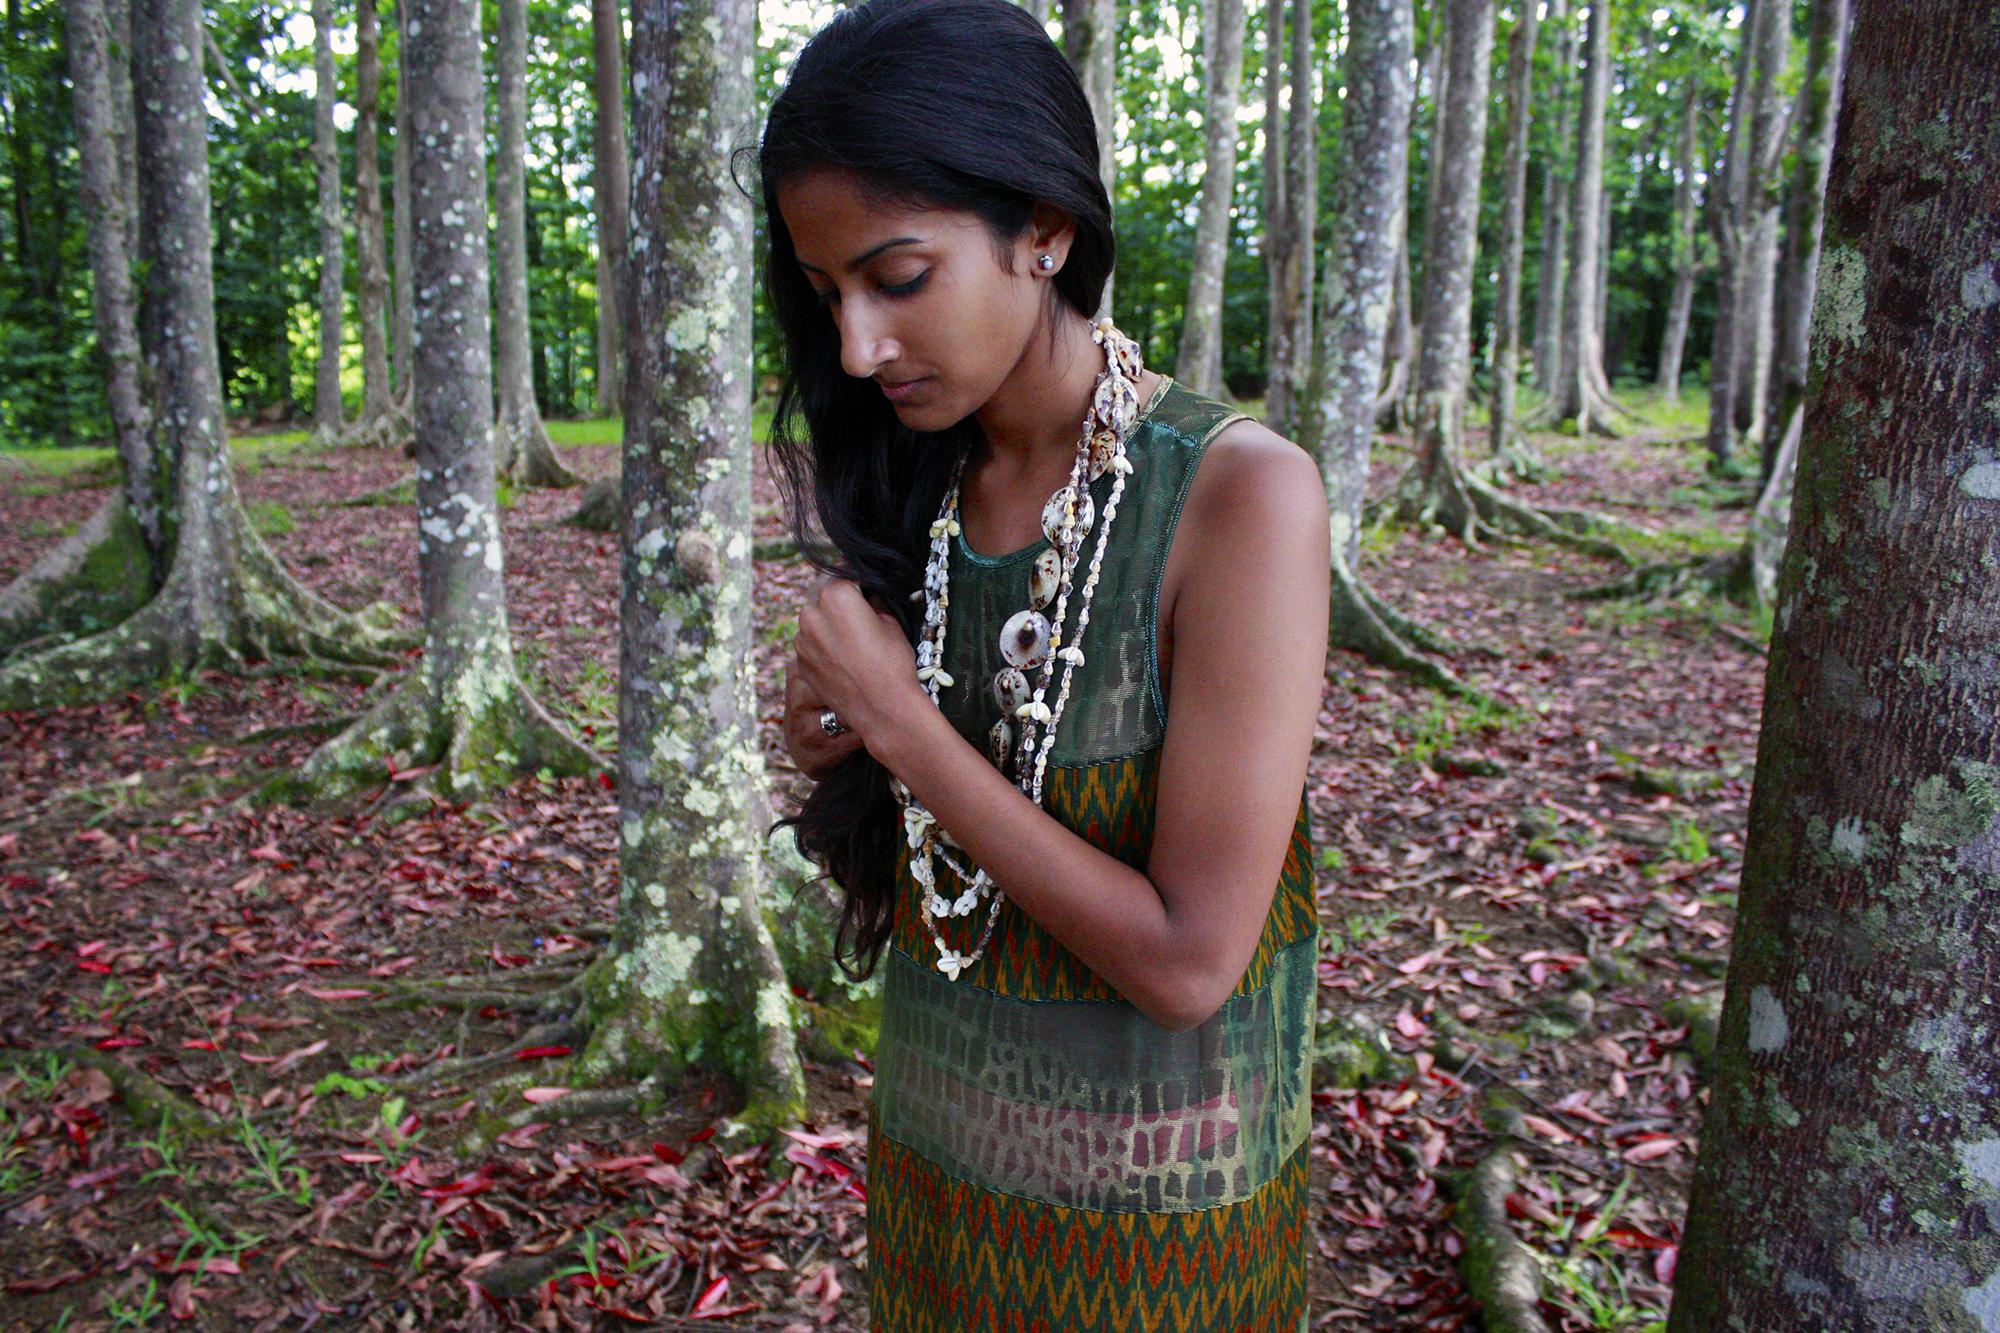 forest dress detail.jpg